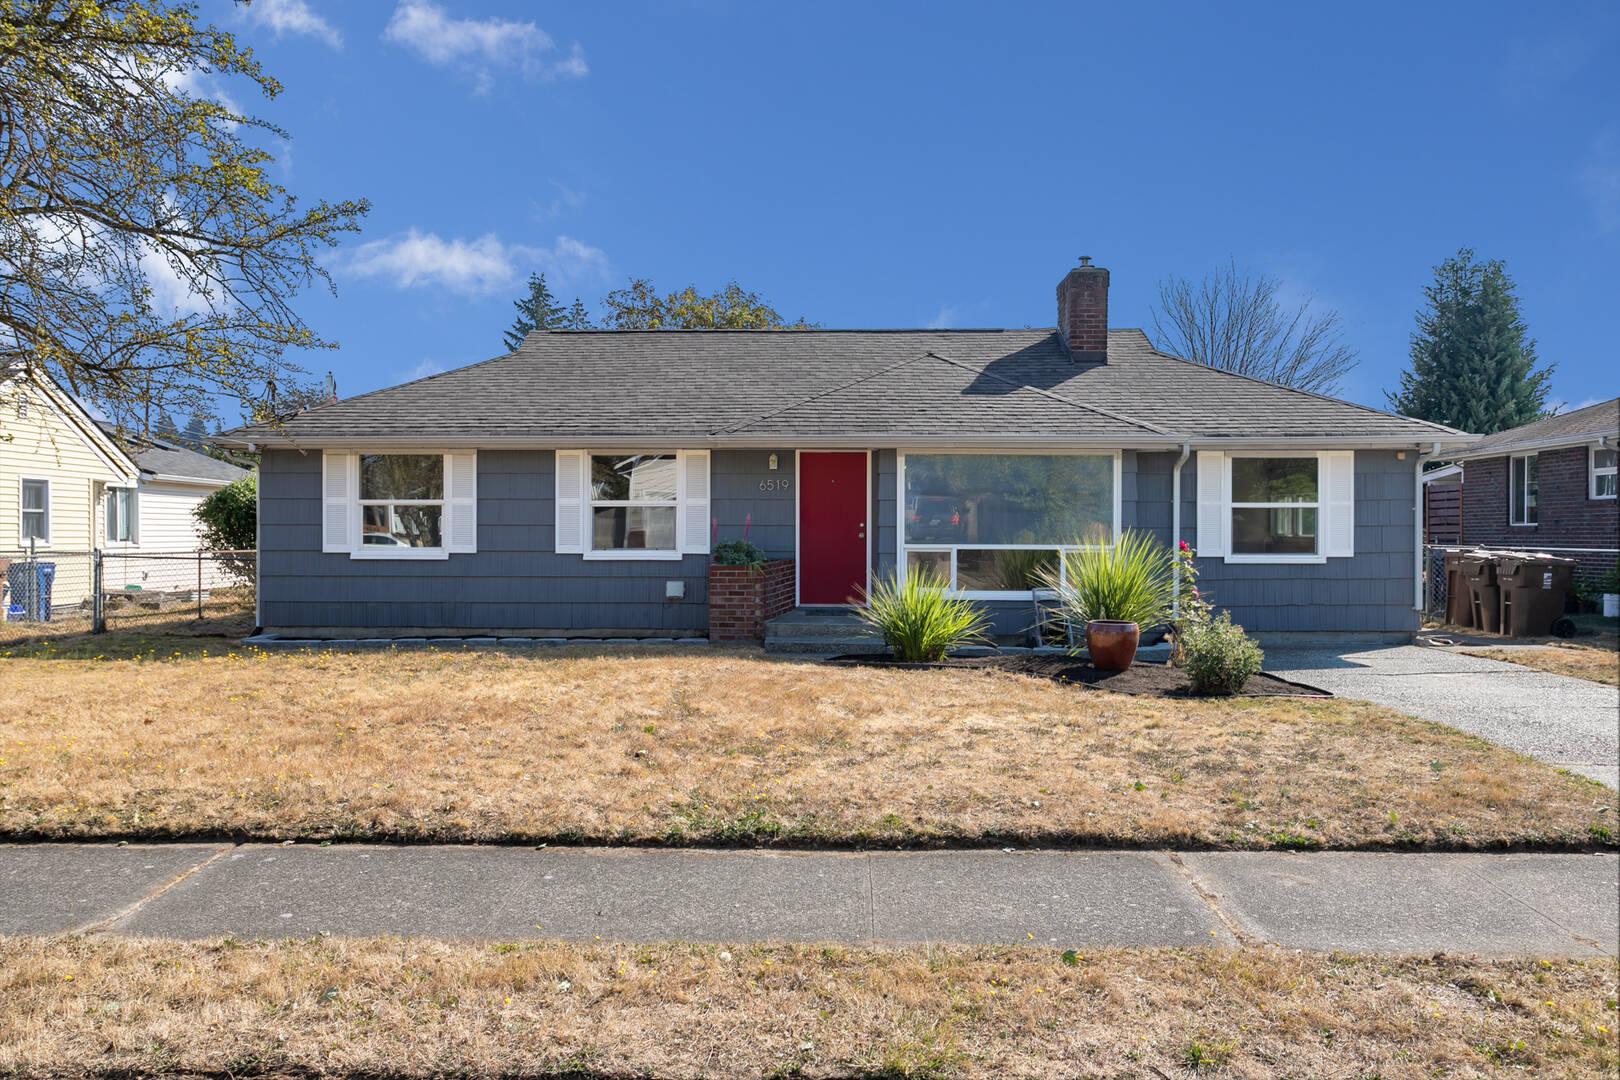 6519 S J St, Tacoma Tacoma, WA 98408